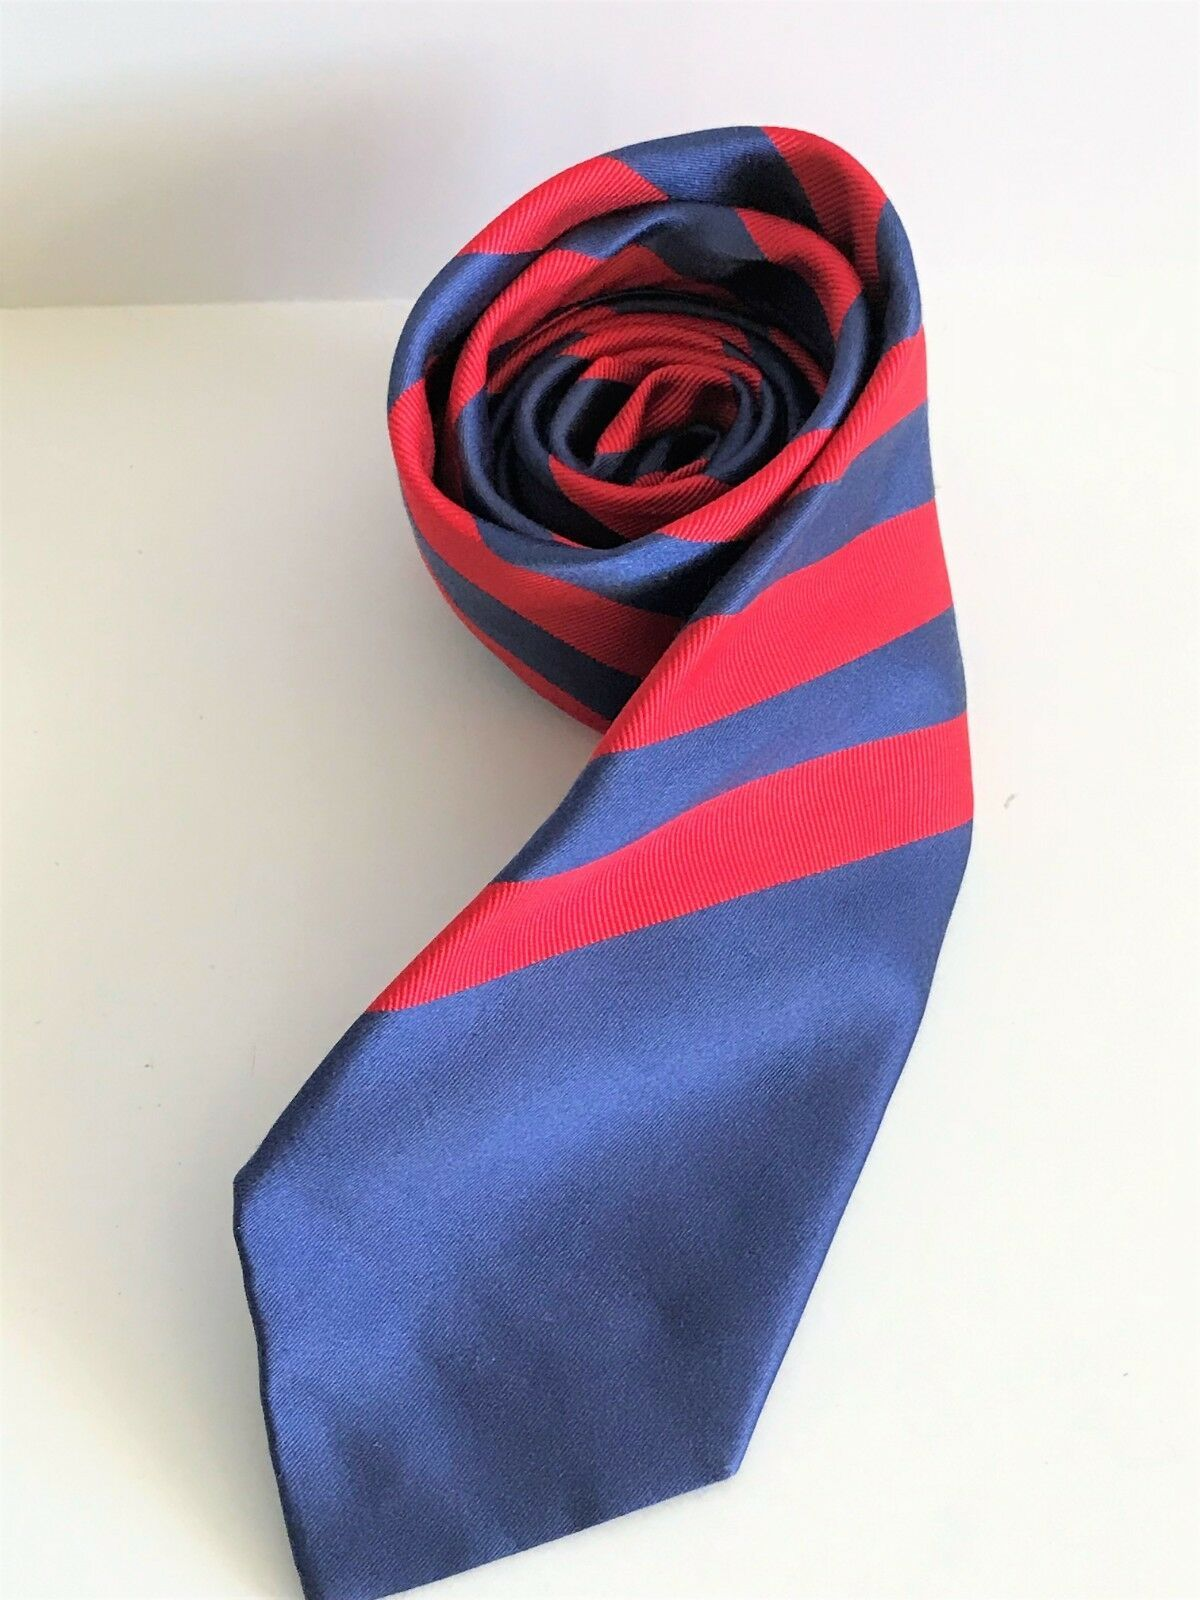 Kenneth Cole Reaction Men's Striped Blue & Red Silk Necktie image 2